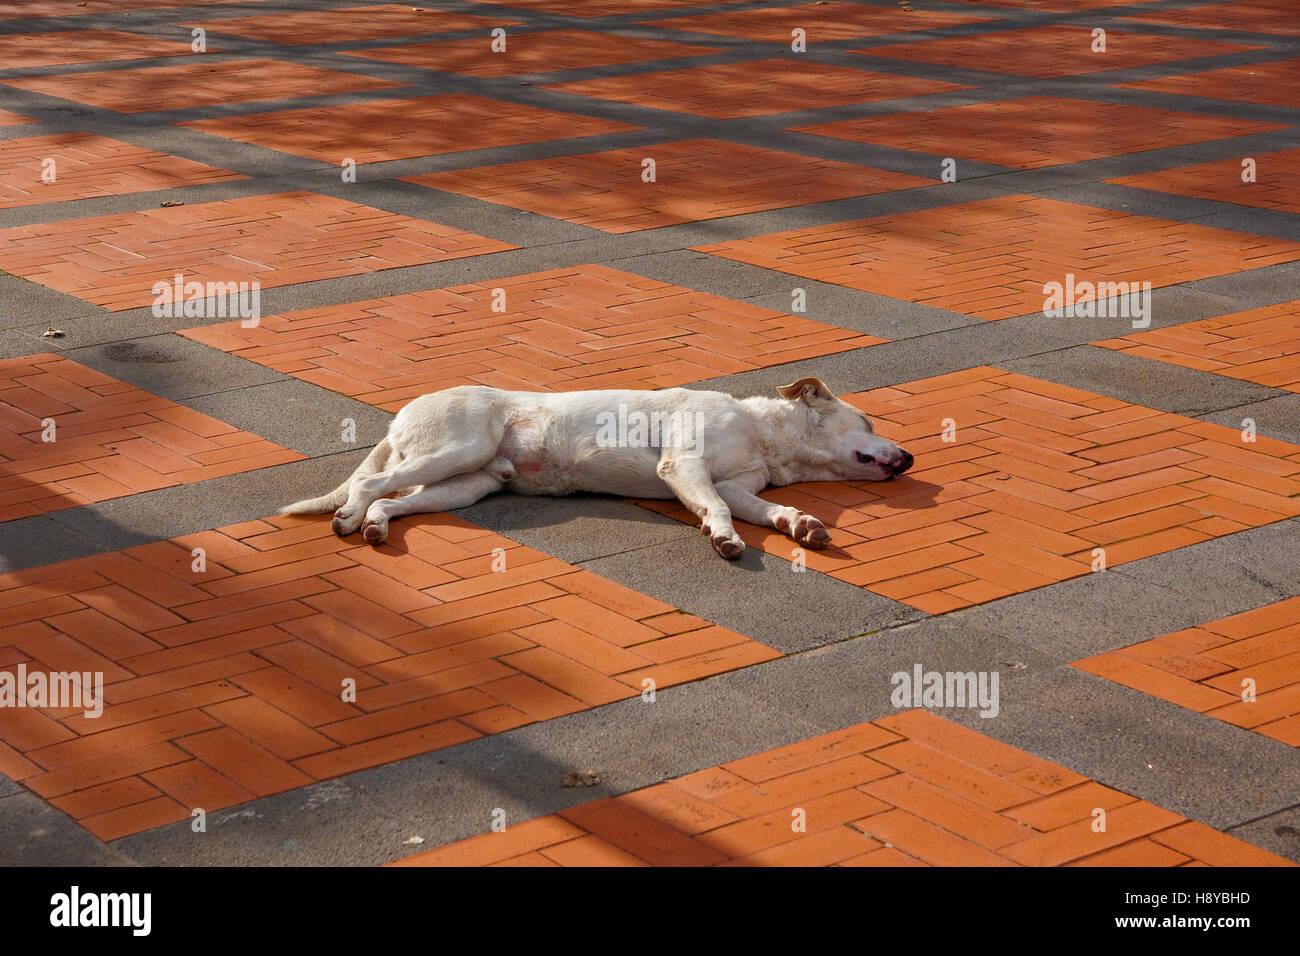 Sleeping dog soaks up the sun in Piazza Sant Andrea, Milo, Sicily - Stock Image